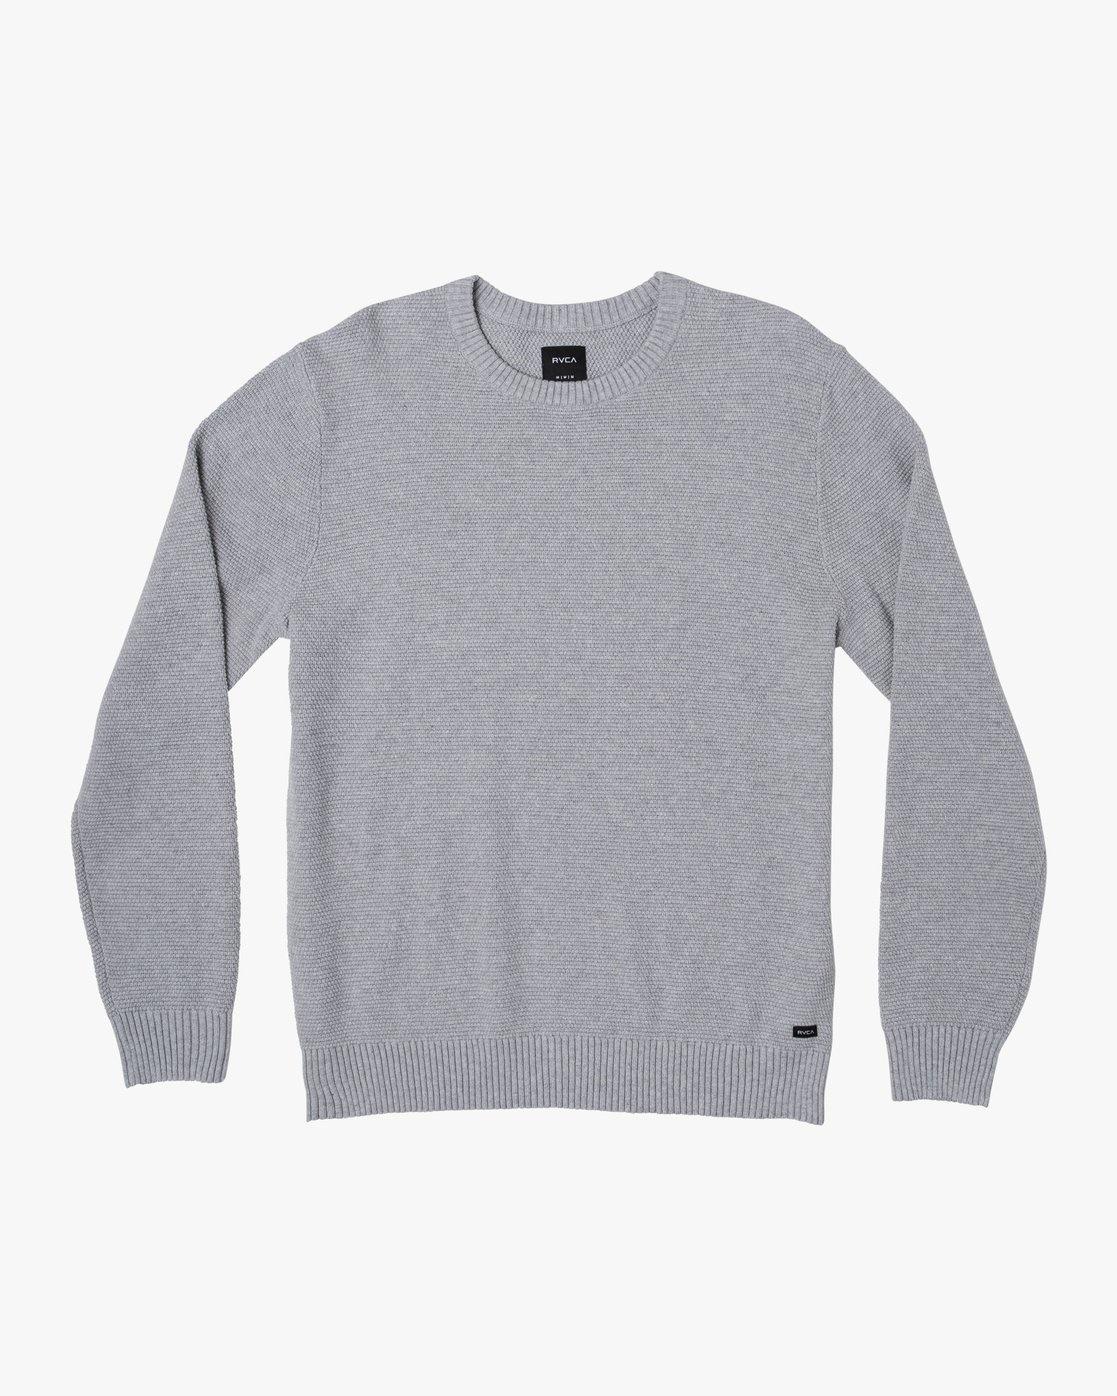 RVCA RVCA Duke Sweater